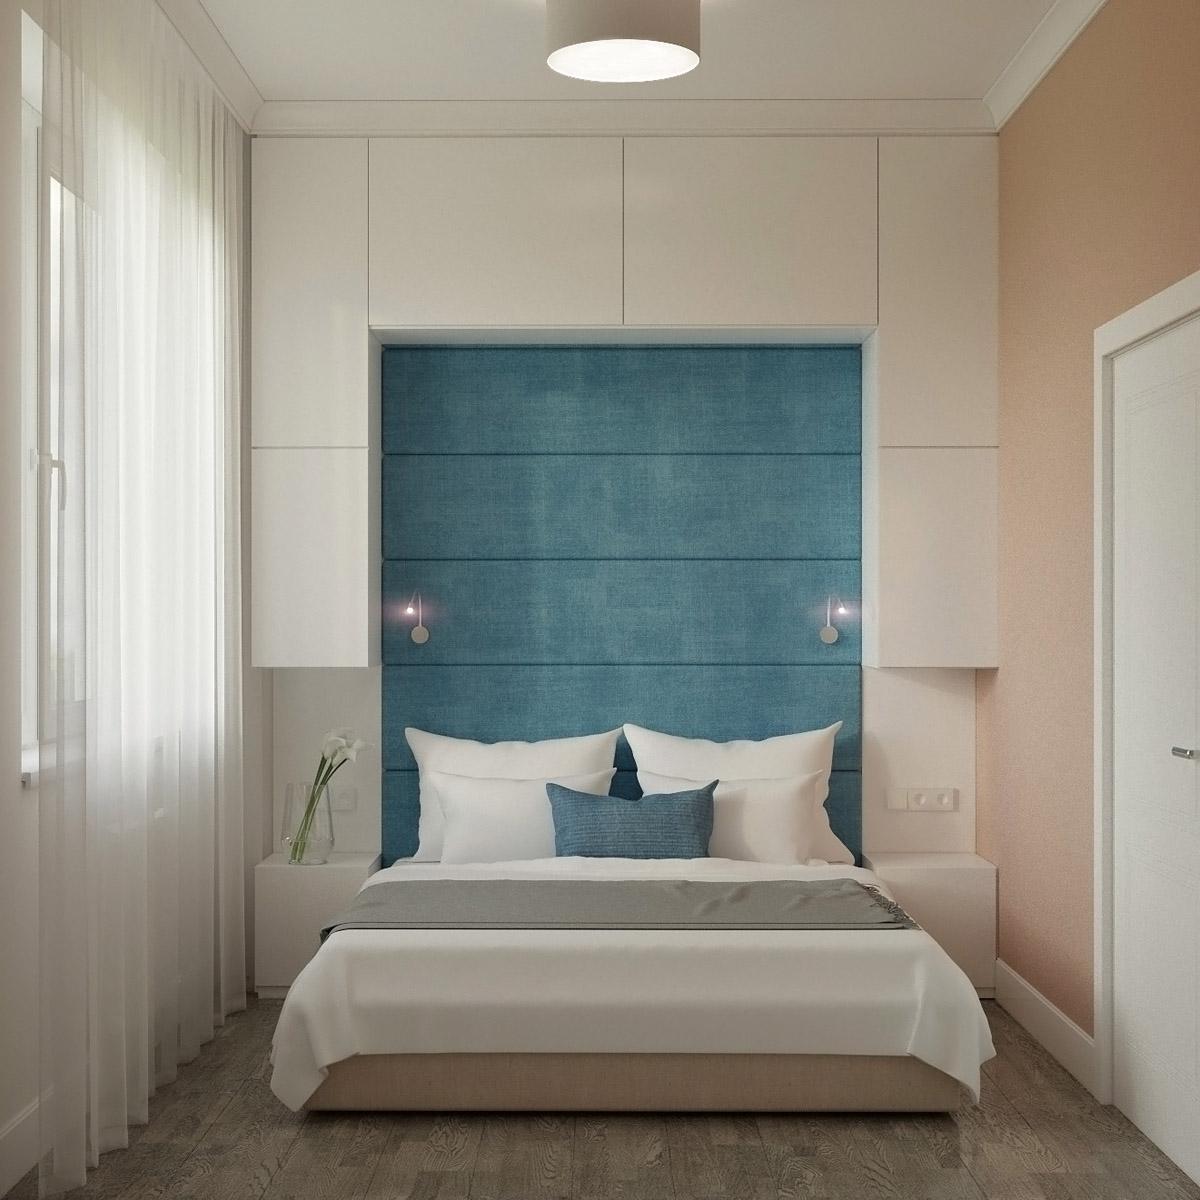 Дизайн спальні | проект Оболонський проспект